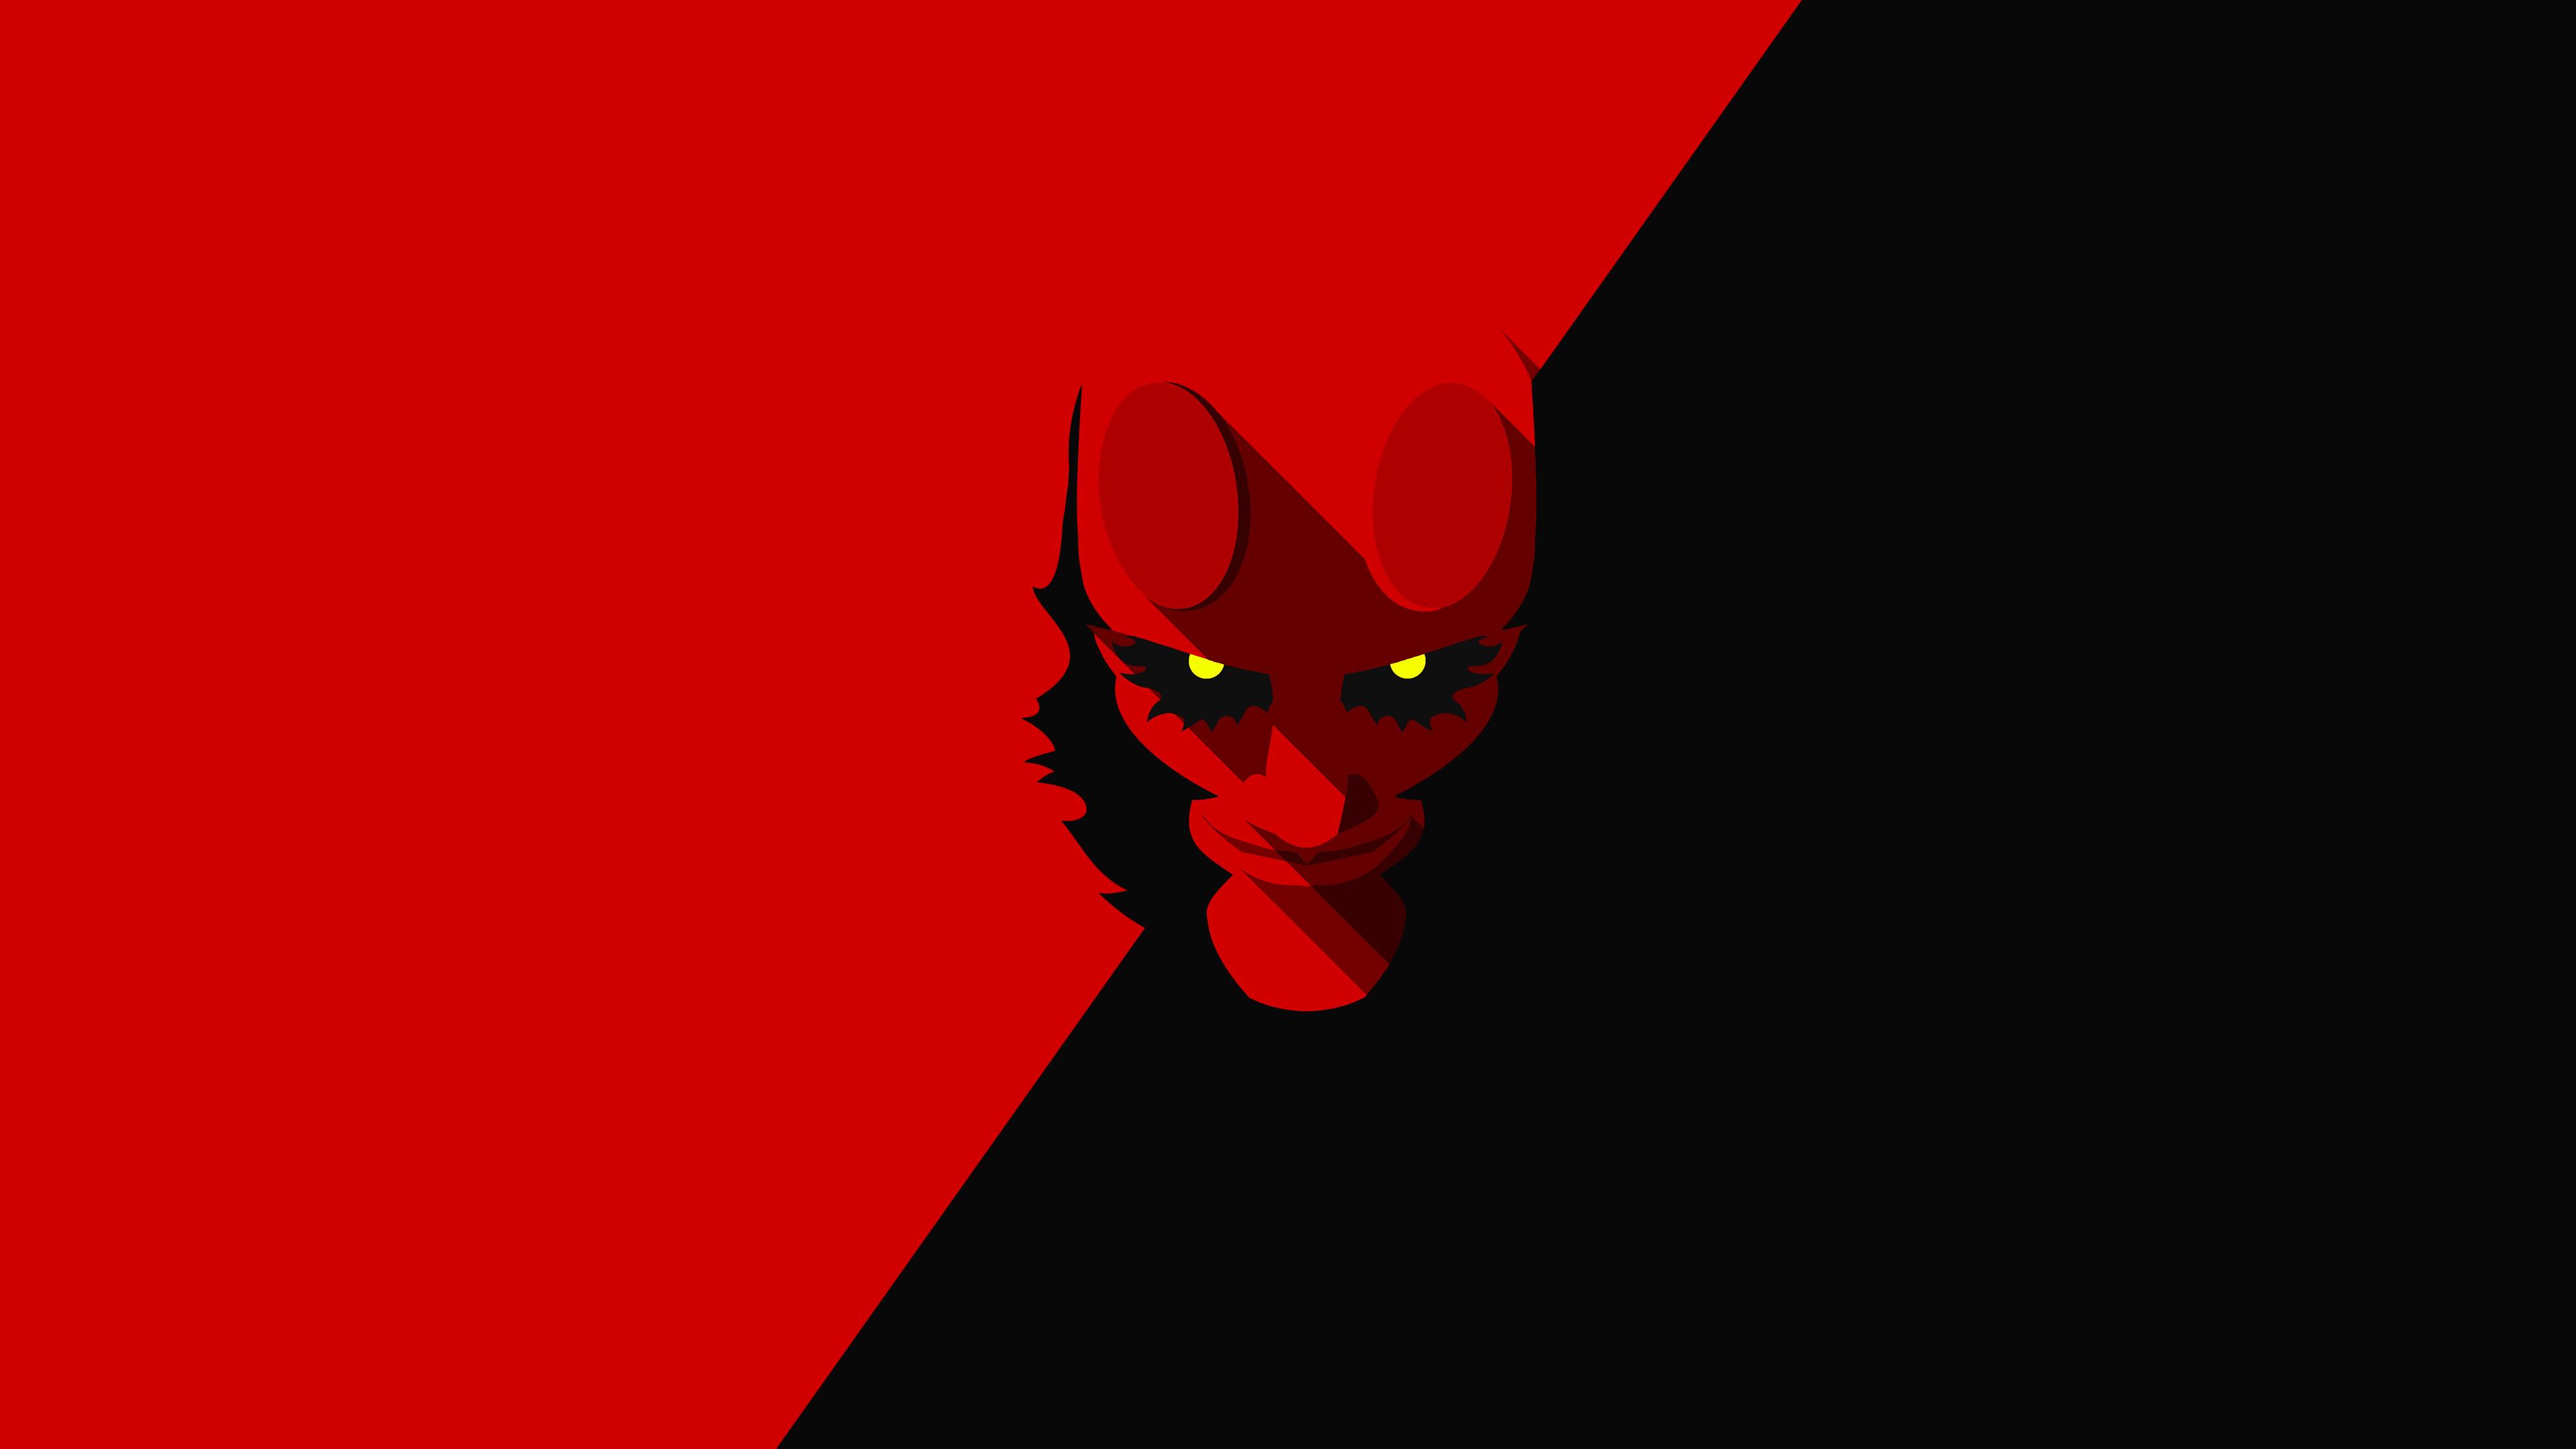 hellboy minimalism 4k 1539452814 - Hellboy Minimalism 4k - superheroes wallpapers, minimalism wallpapers, hellboy wallpapers, hd-wallpapers, digital art wallpapers, behance wallpapers, artwork wallpapers, 4k-wallpapers